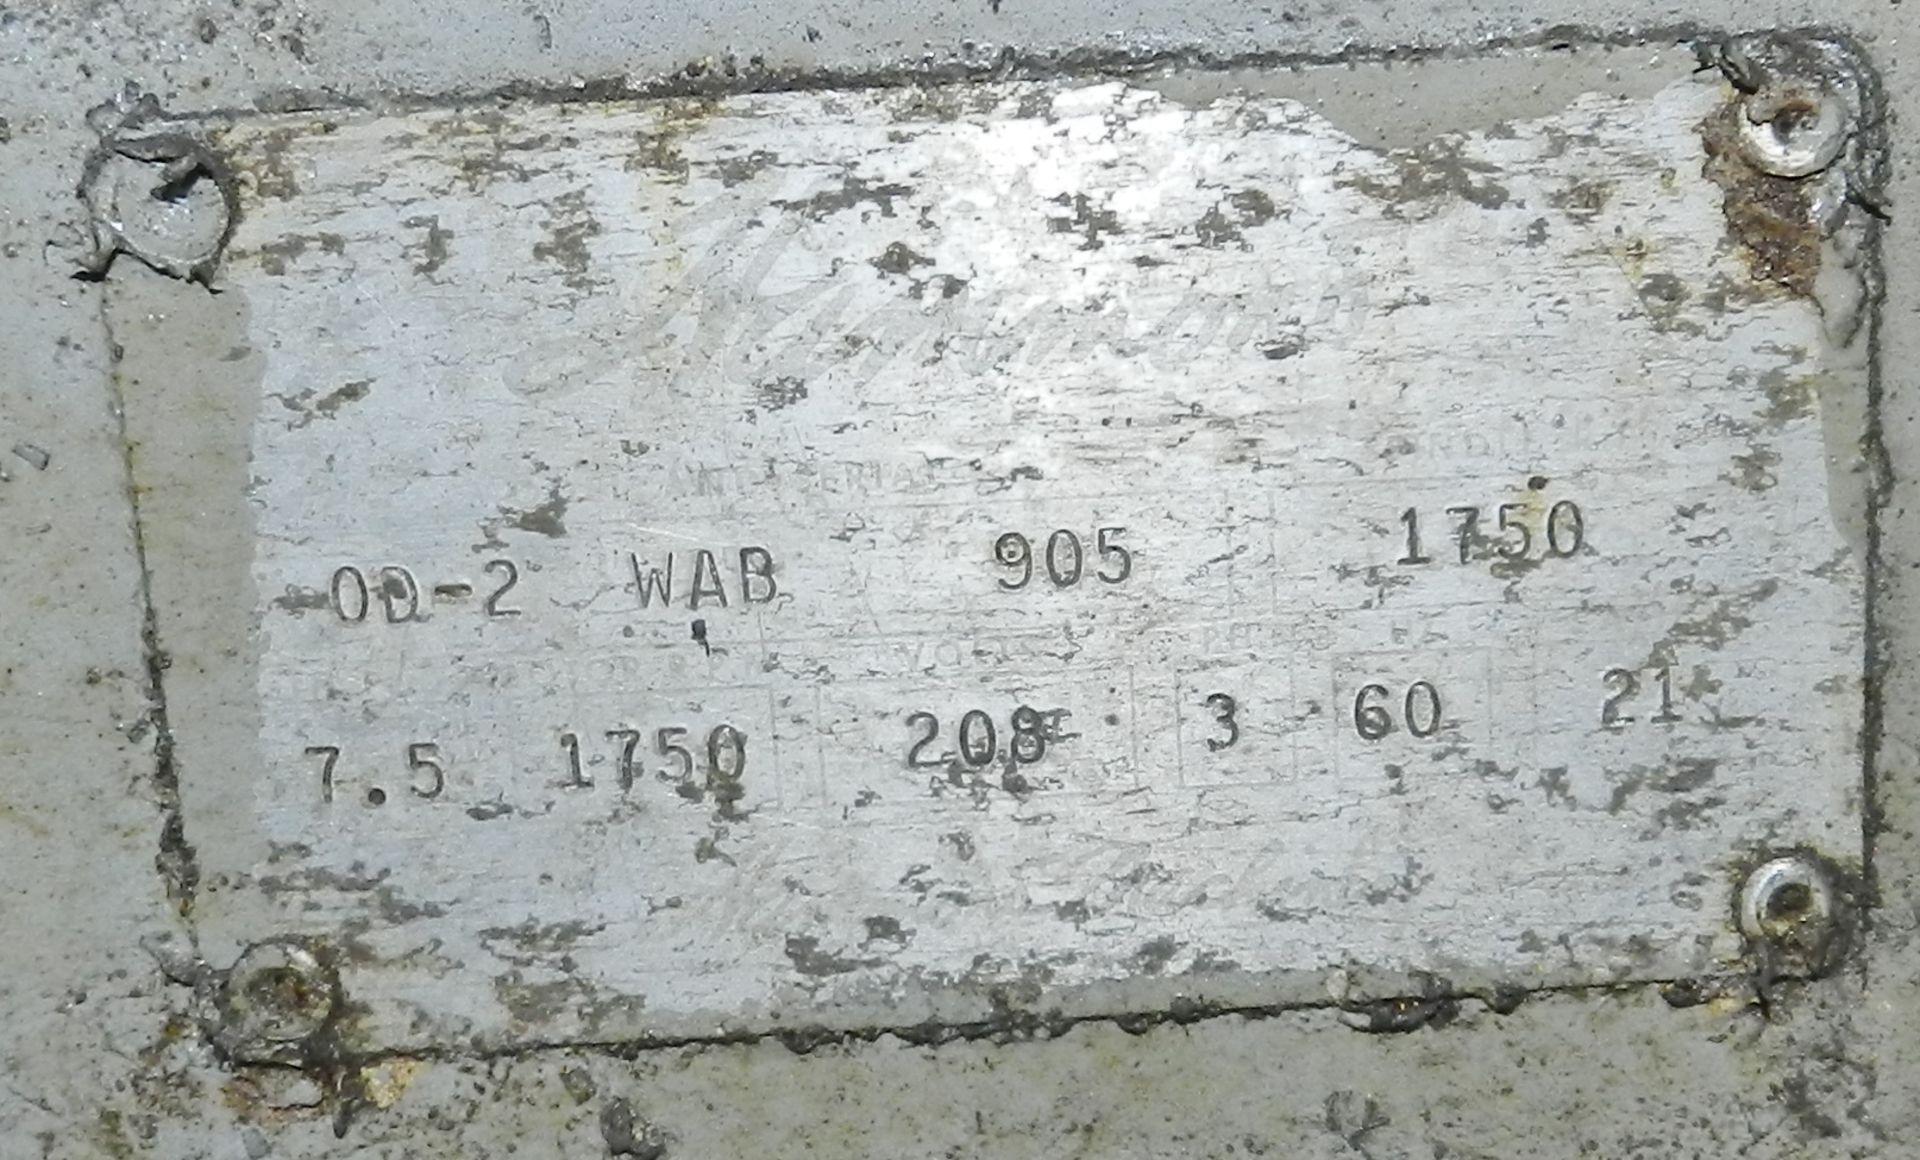 Lot 59 - Hammond OD-2 WAB Cylindrical OD Finisher